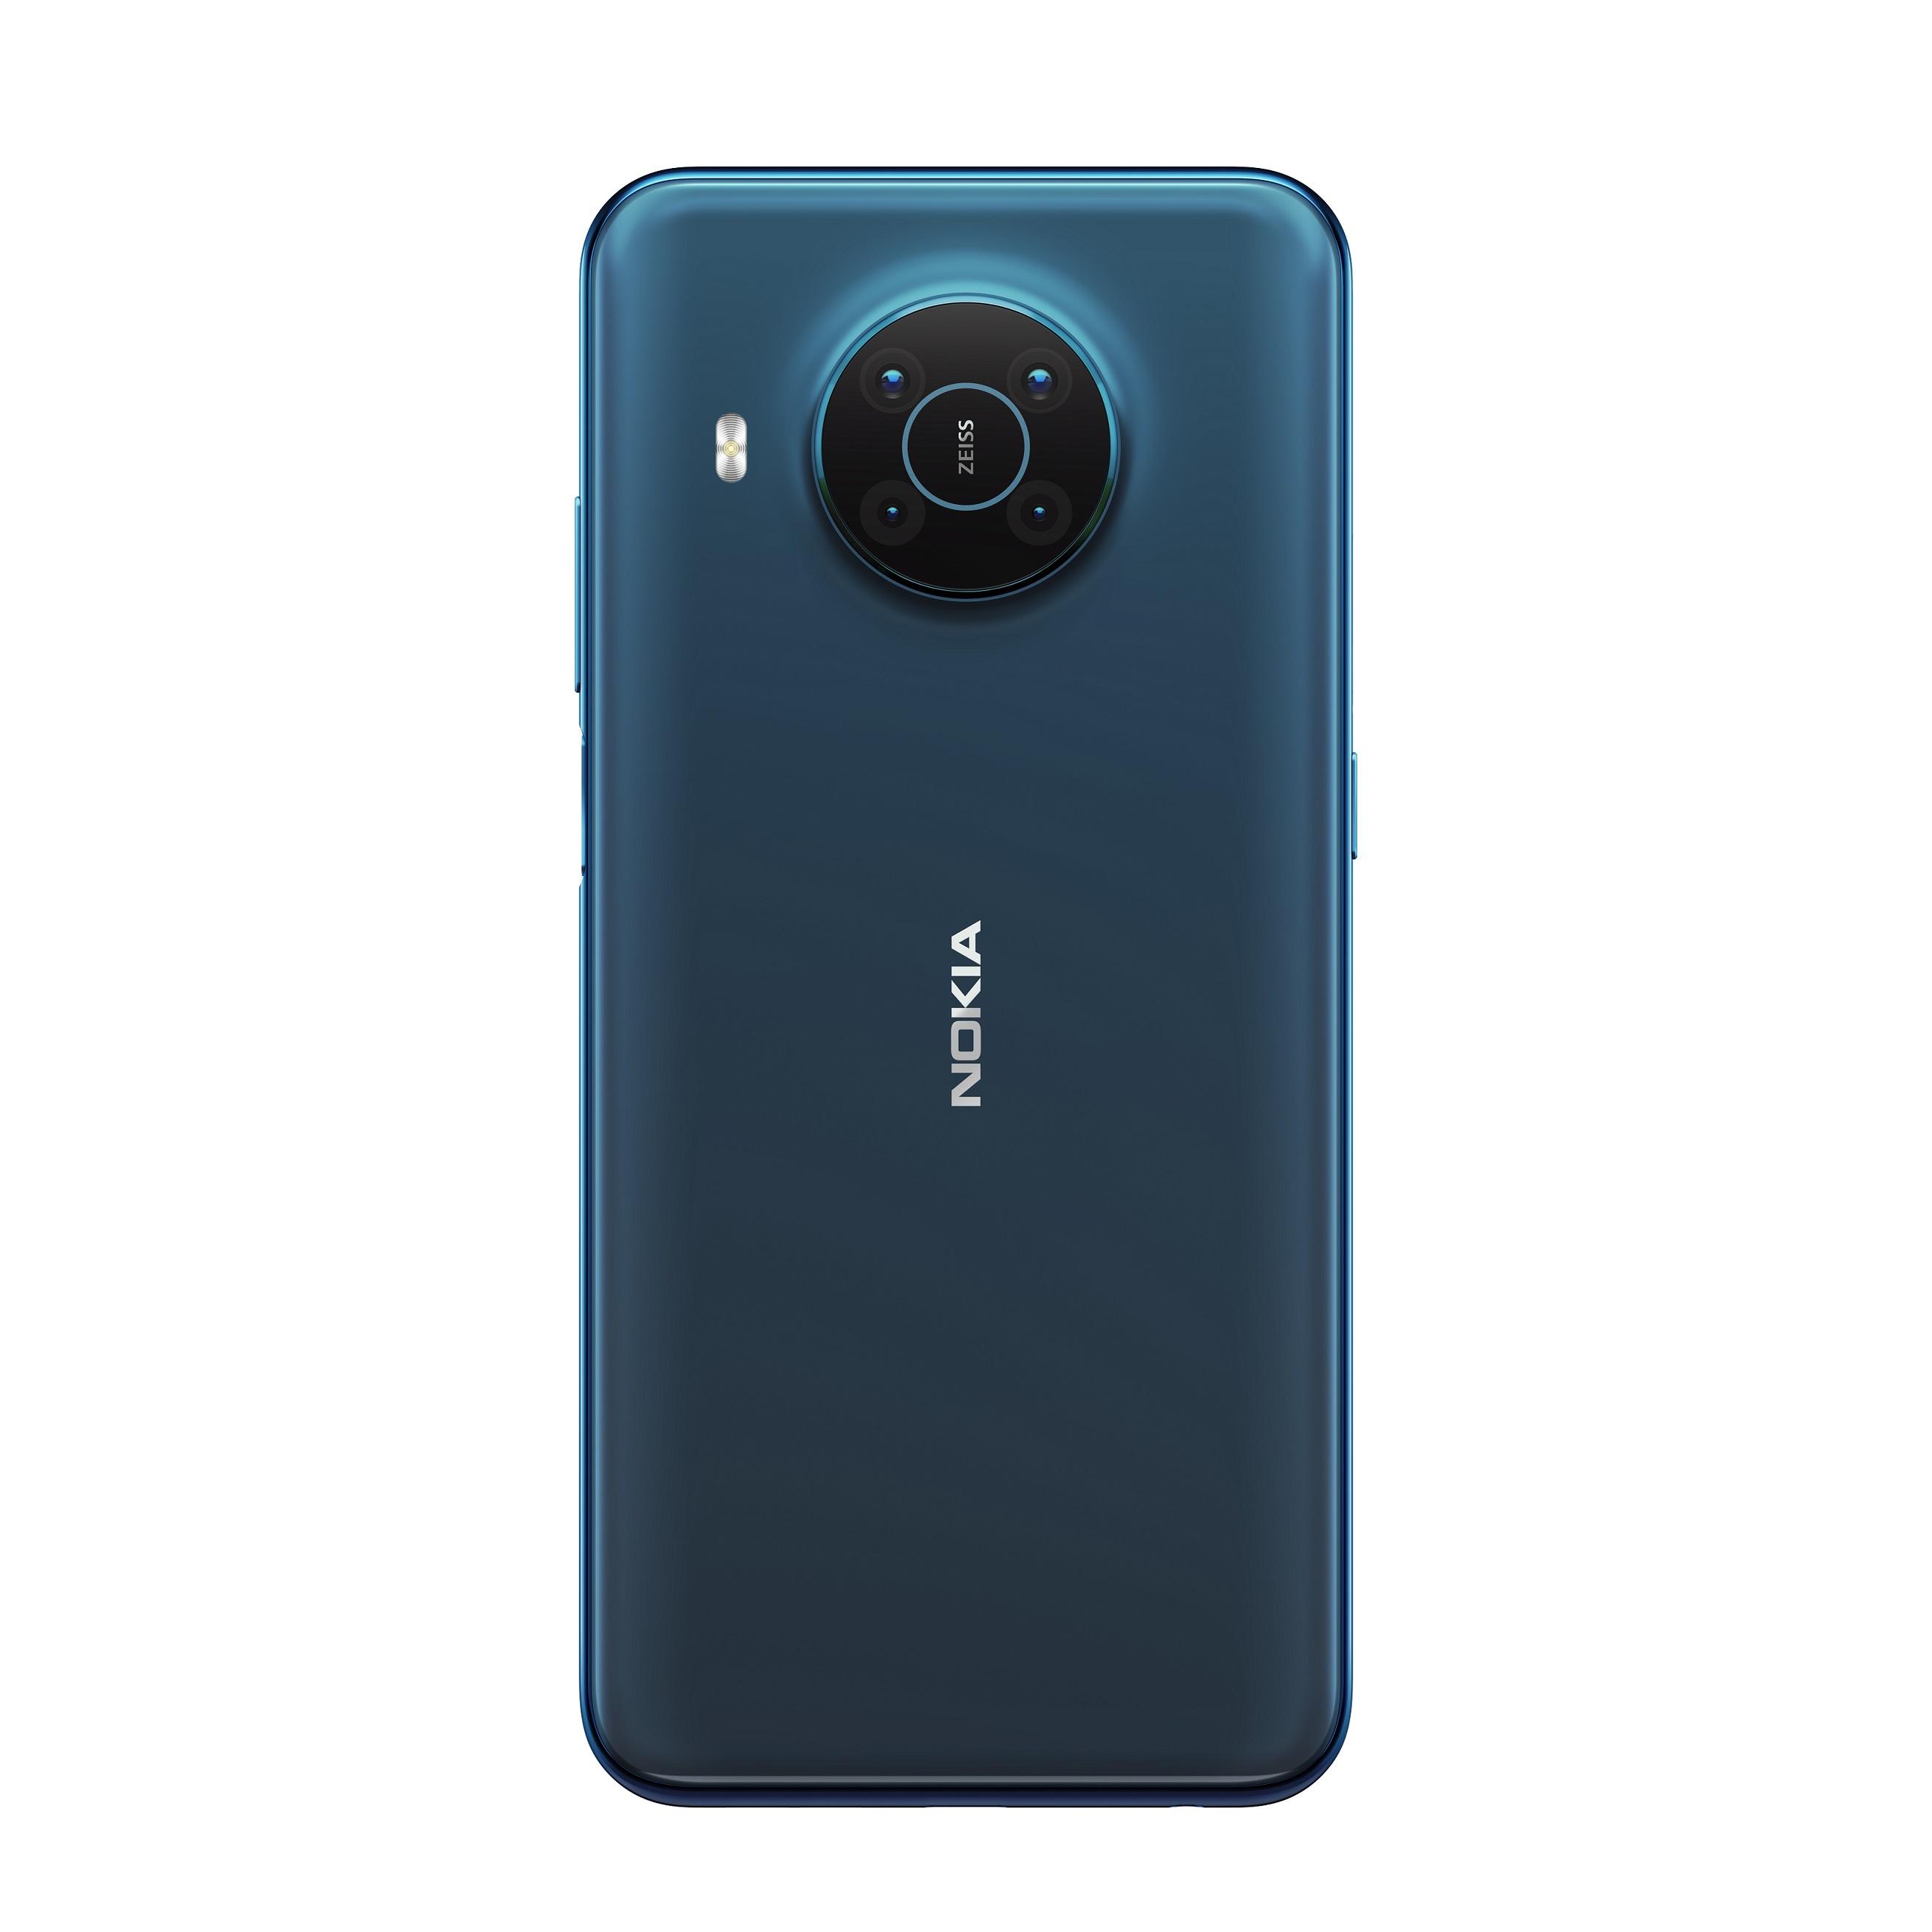 Nokia X20 (6/128GB) Dual SIM Nordic Blue (modrá) - 101QKSLVH041